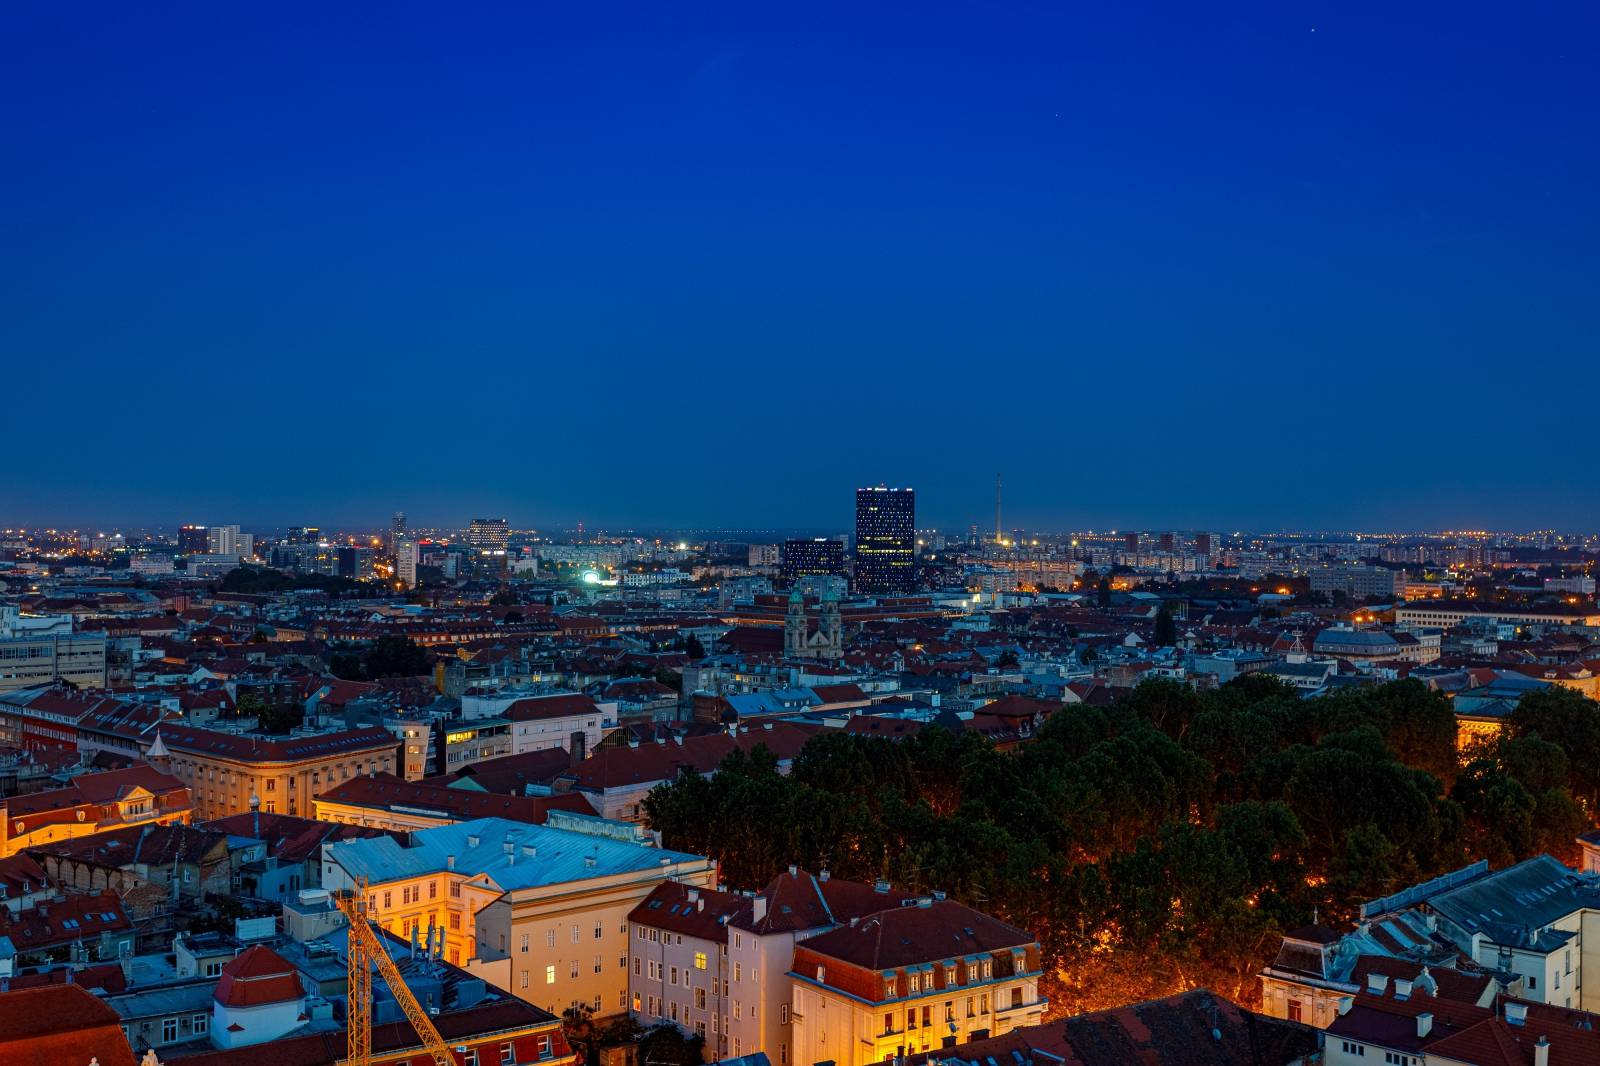 Pogled na grad Zagreb u sumrak